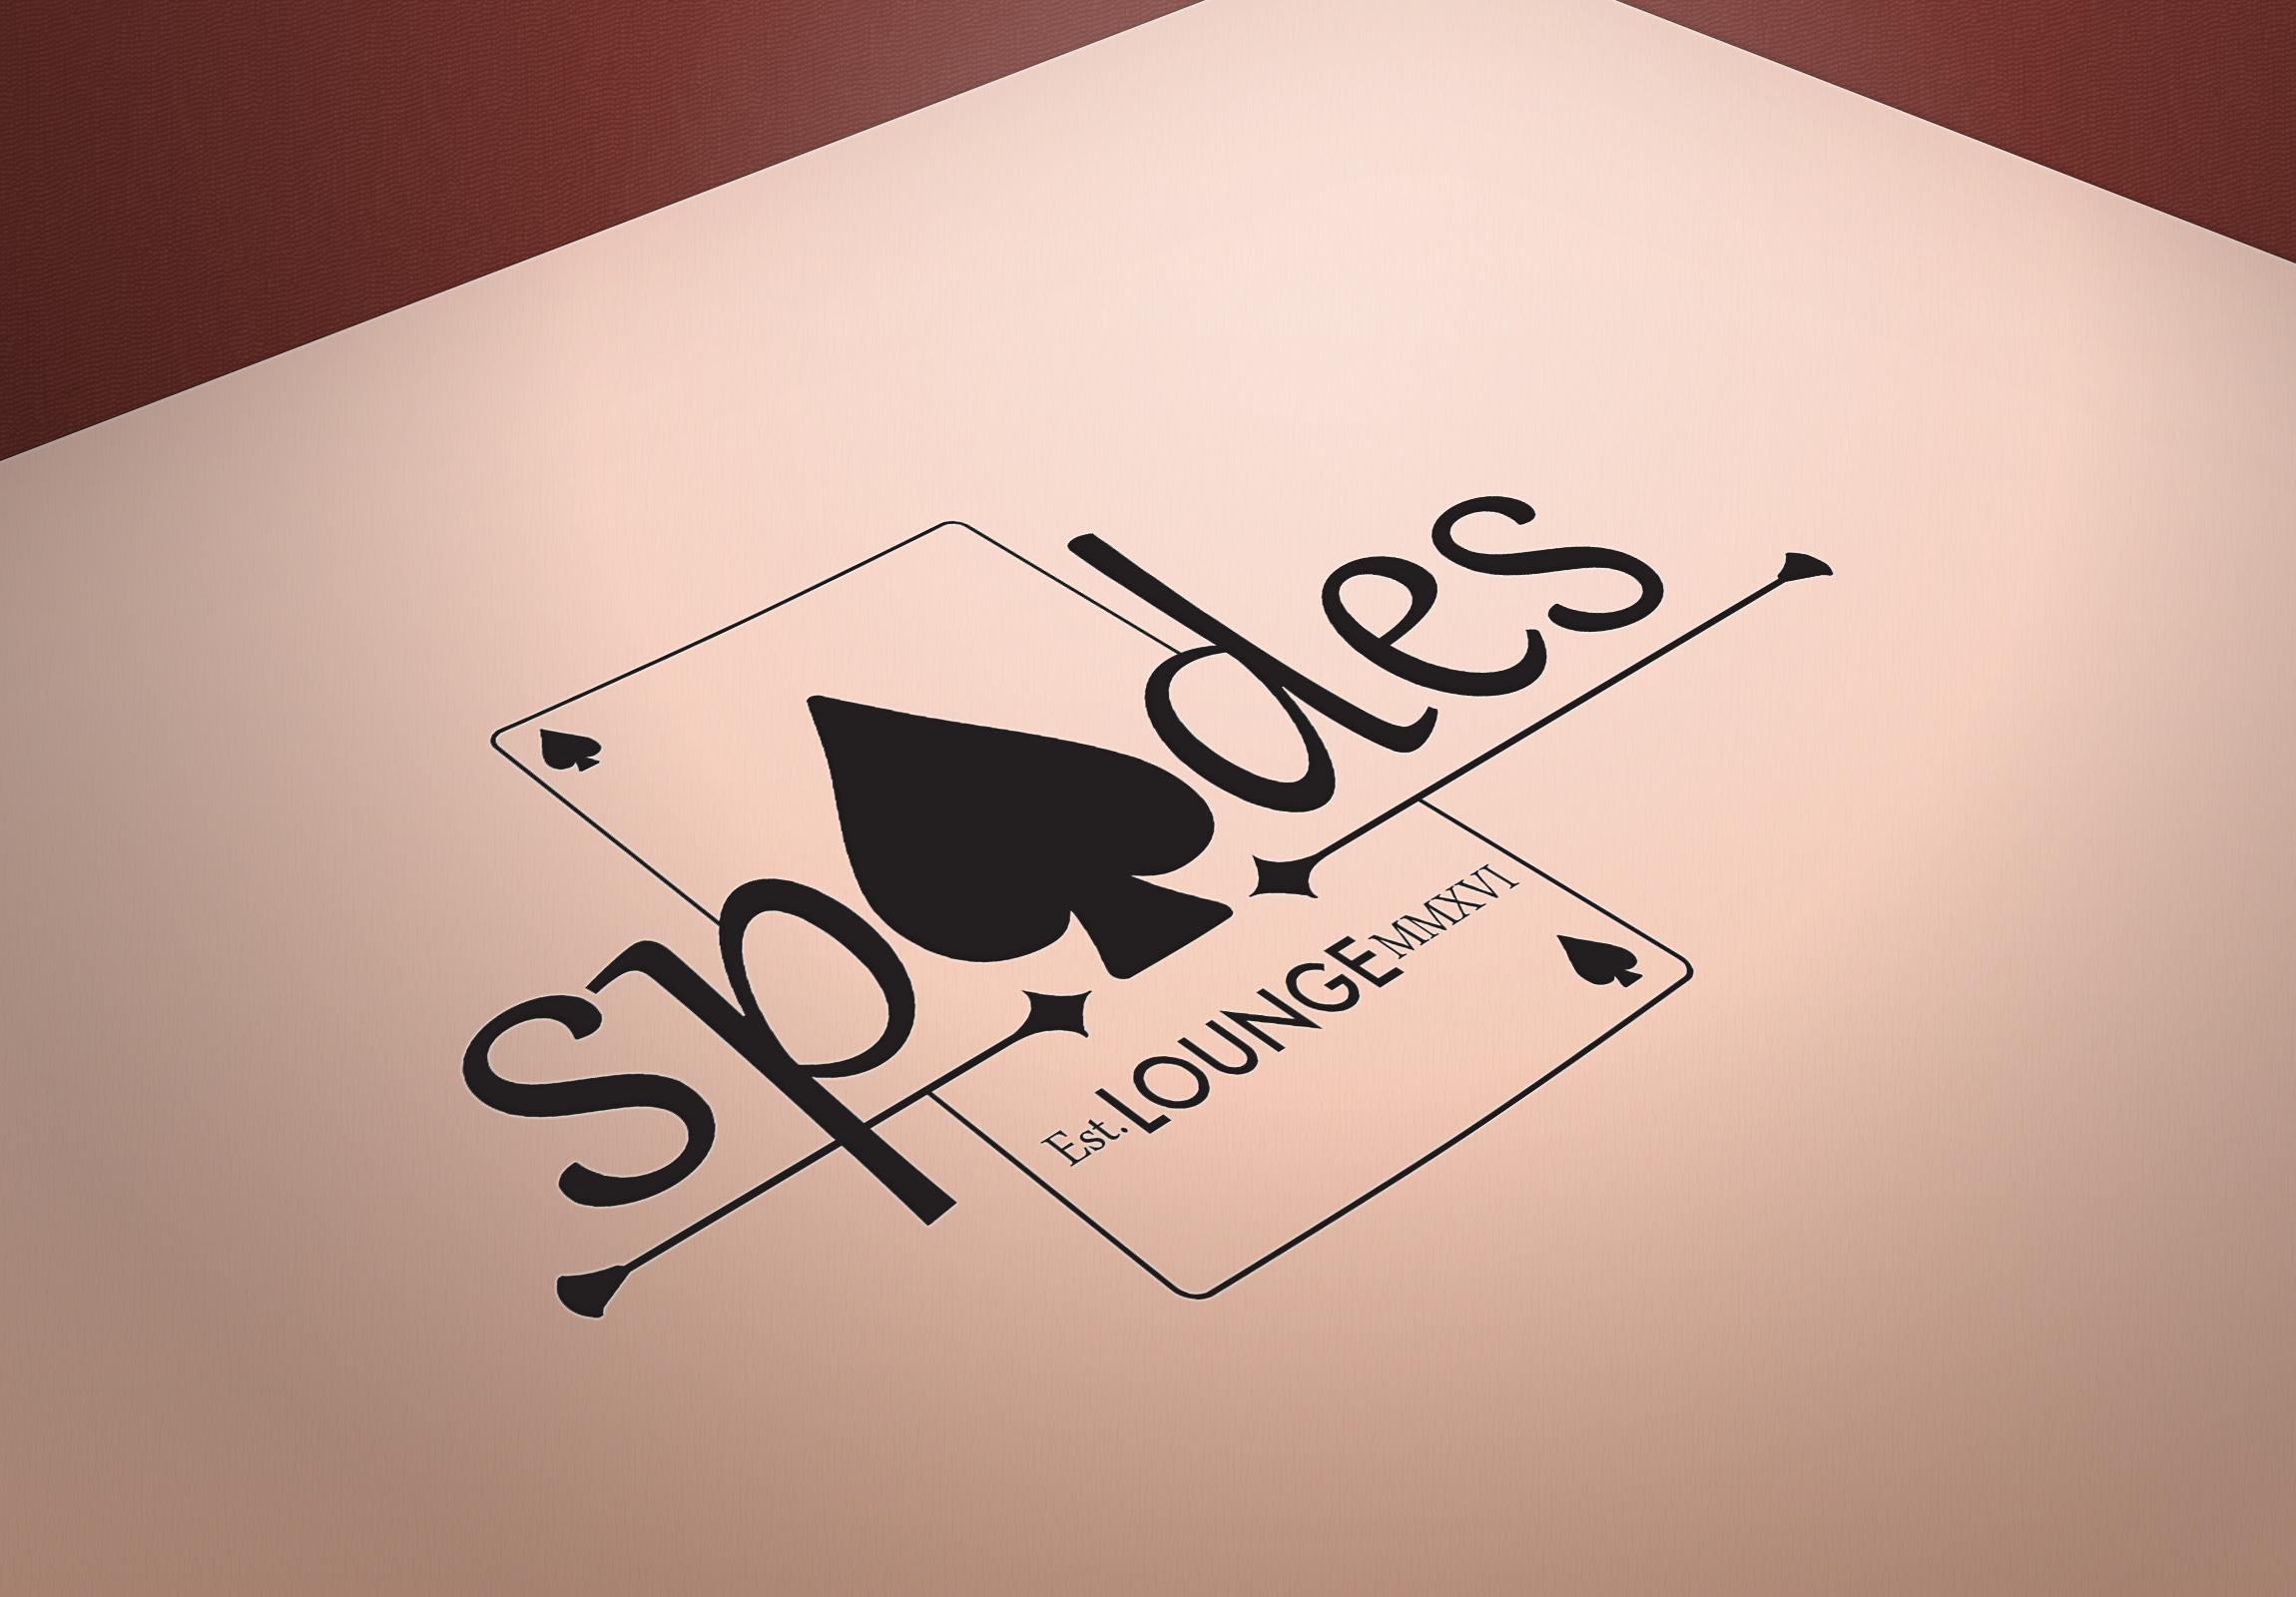 spades logo.jpg